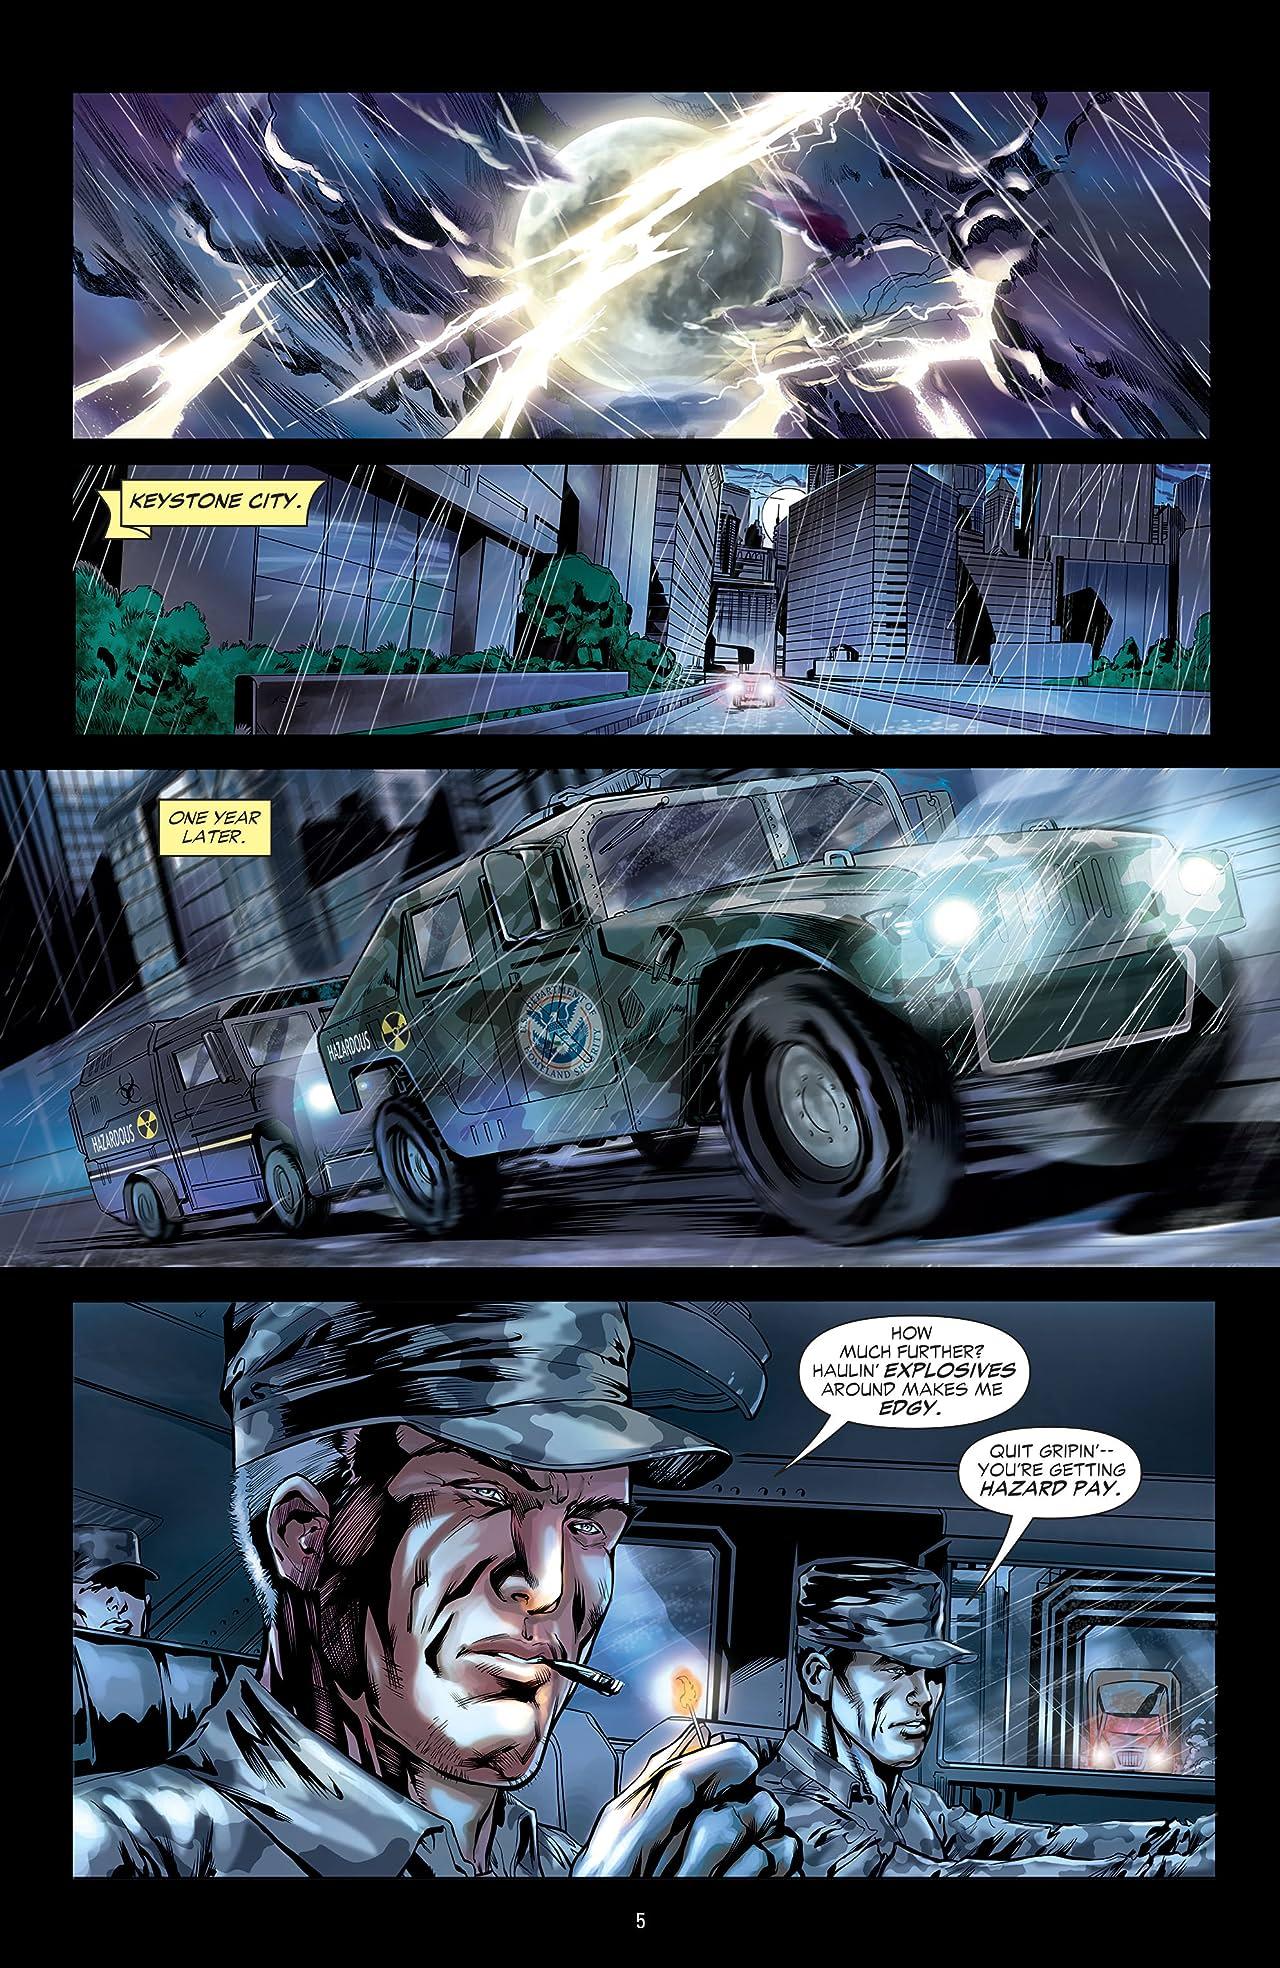 Flash: The Fastest Man Alive (2006-2007): Lightning In A Bottle